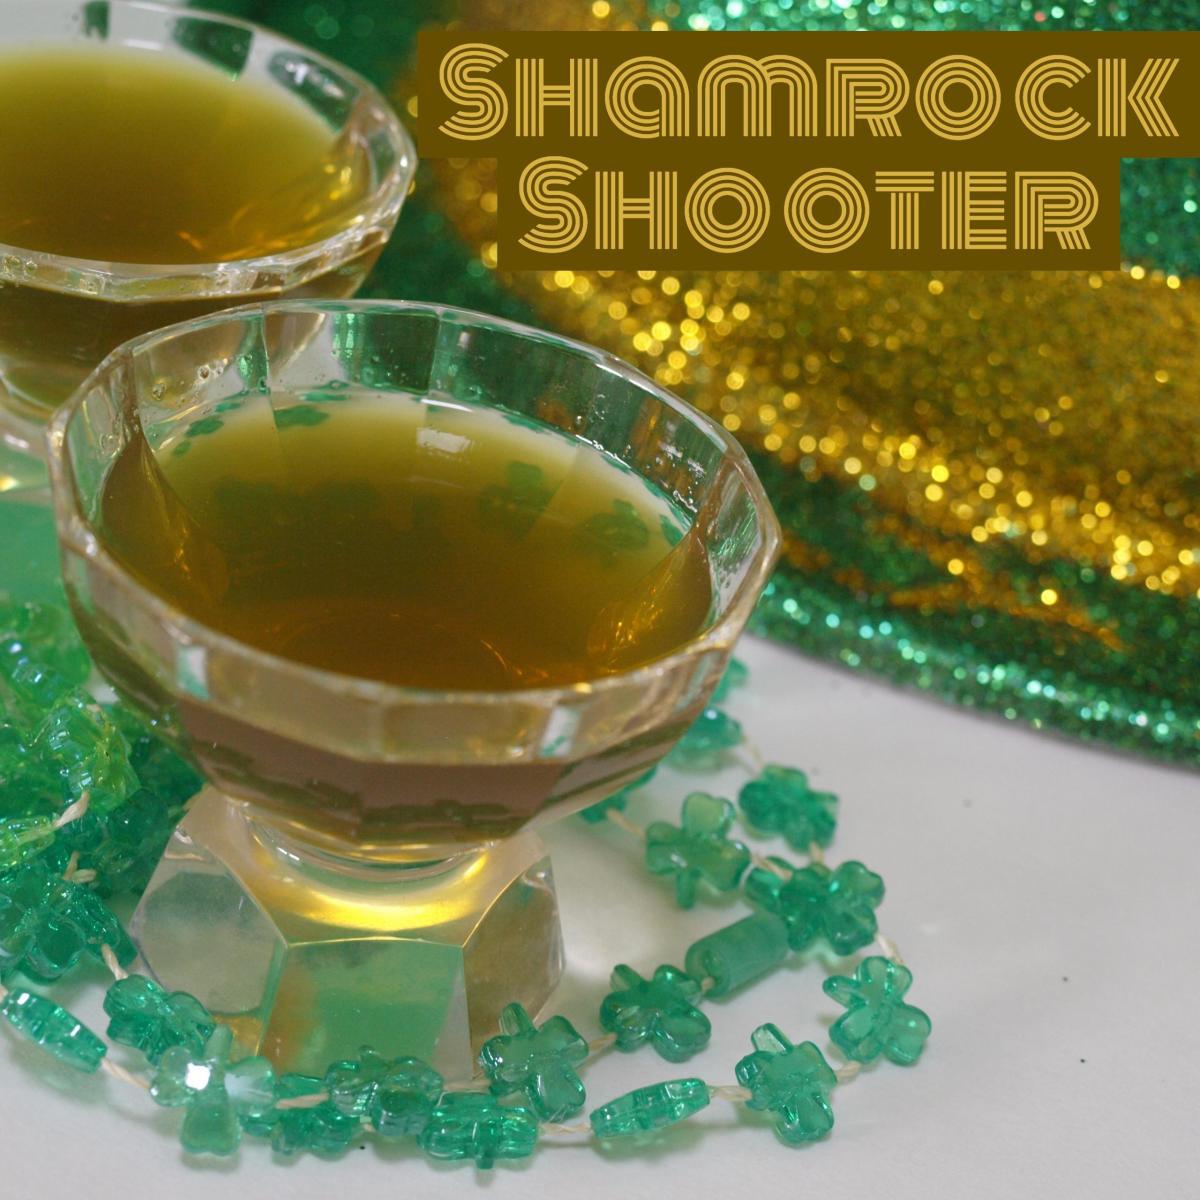 Shamrock Shooter